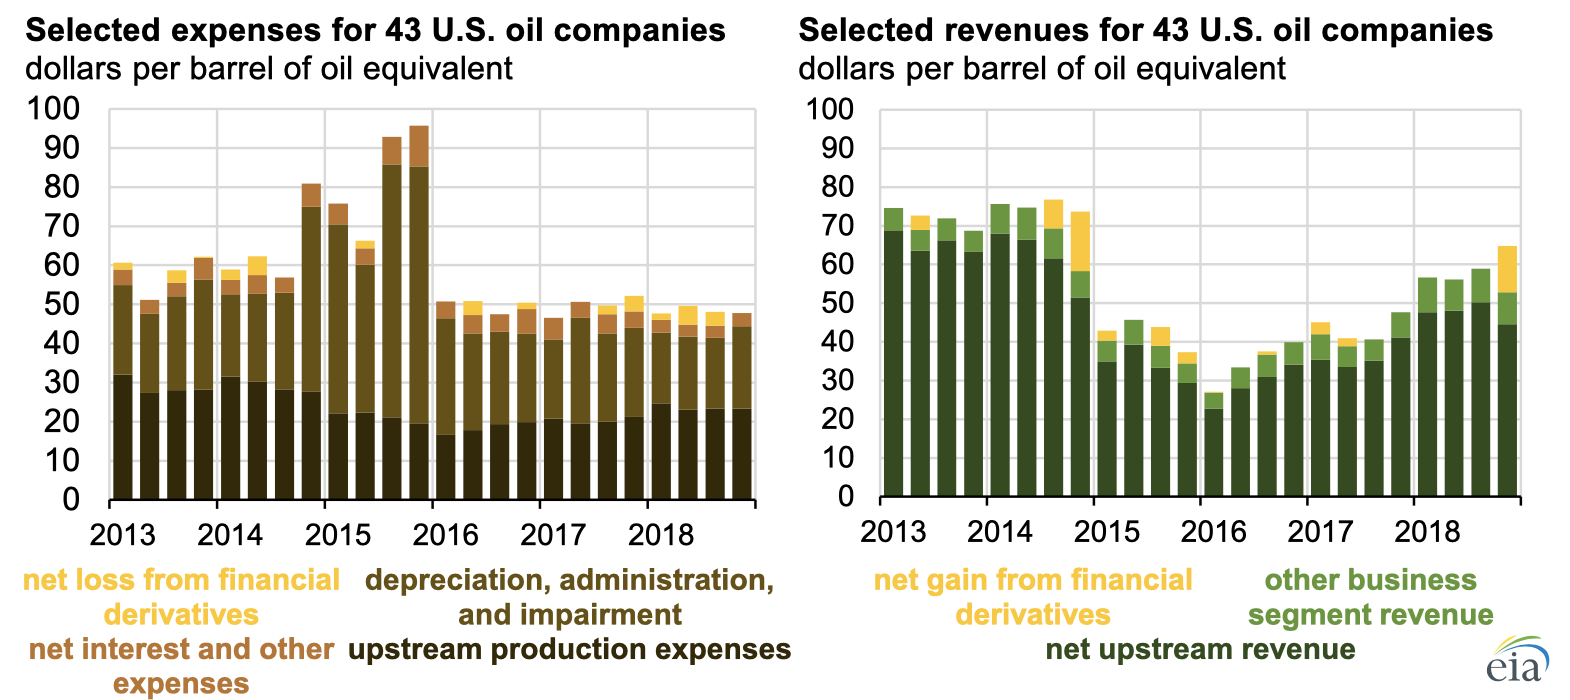 Source: U.S. Energy Information Administration, based on Evaluate Energy